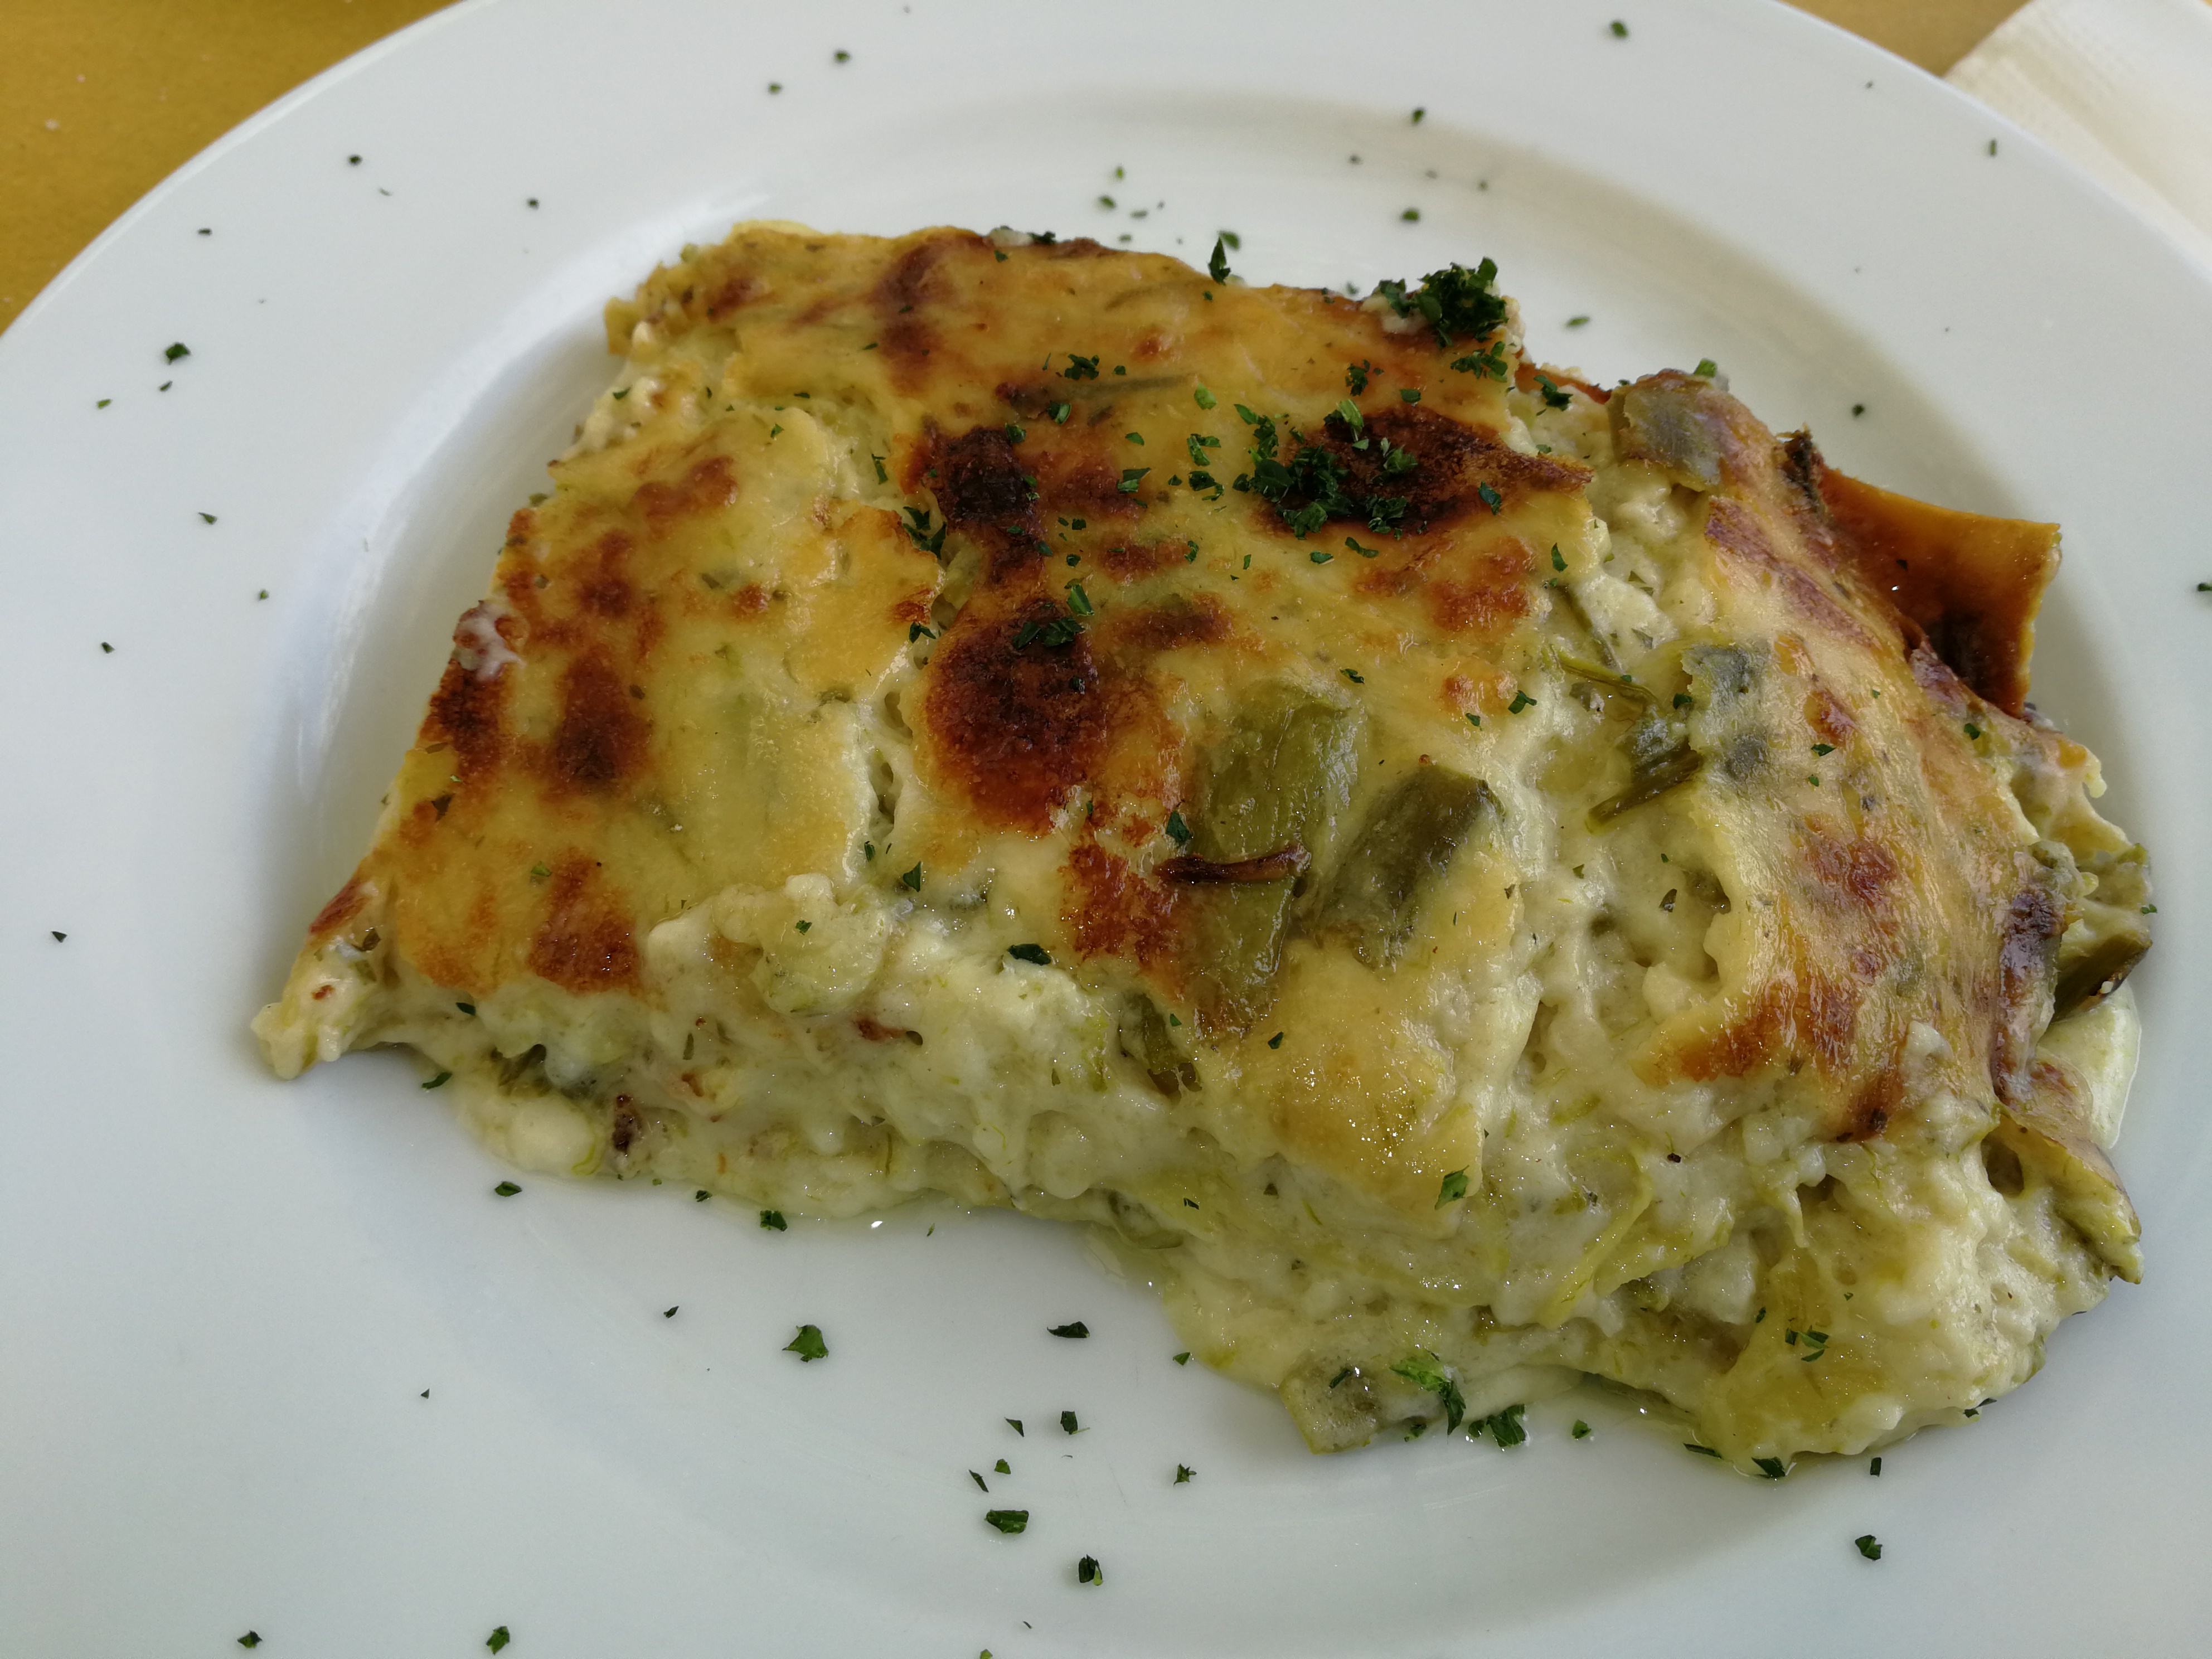 Lasagne con asparagi e montasio